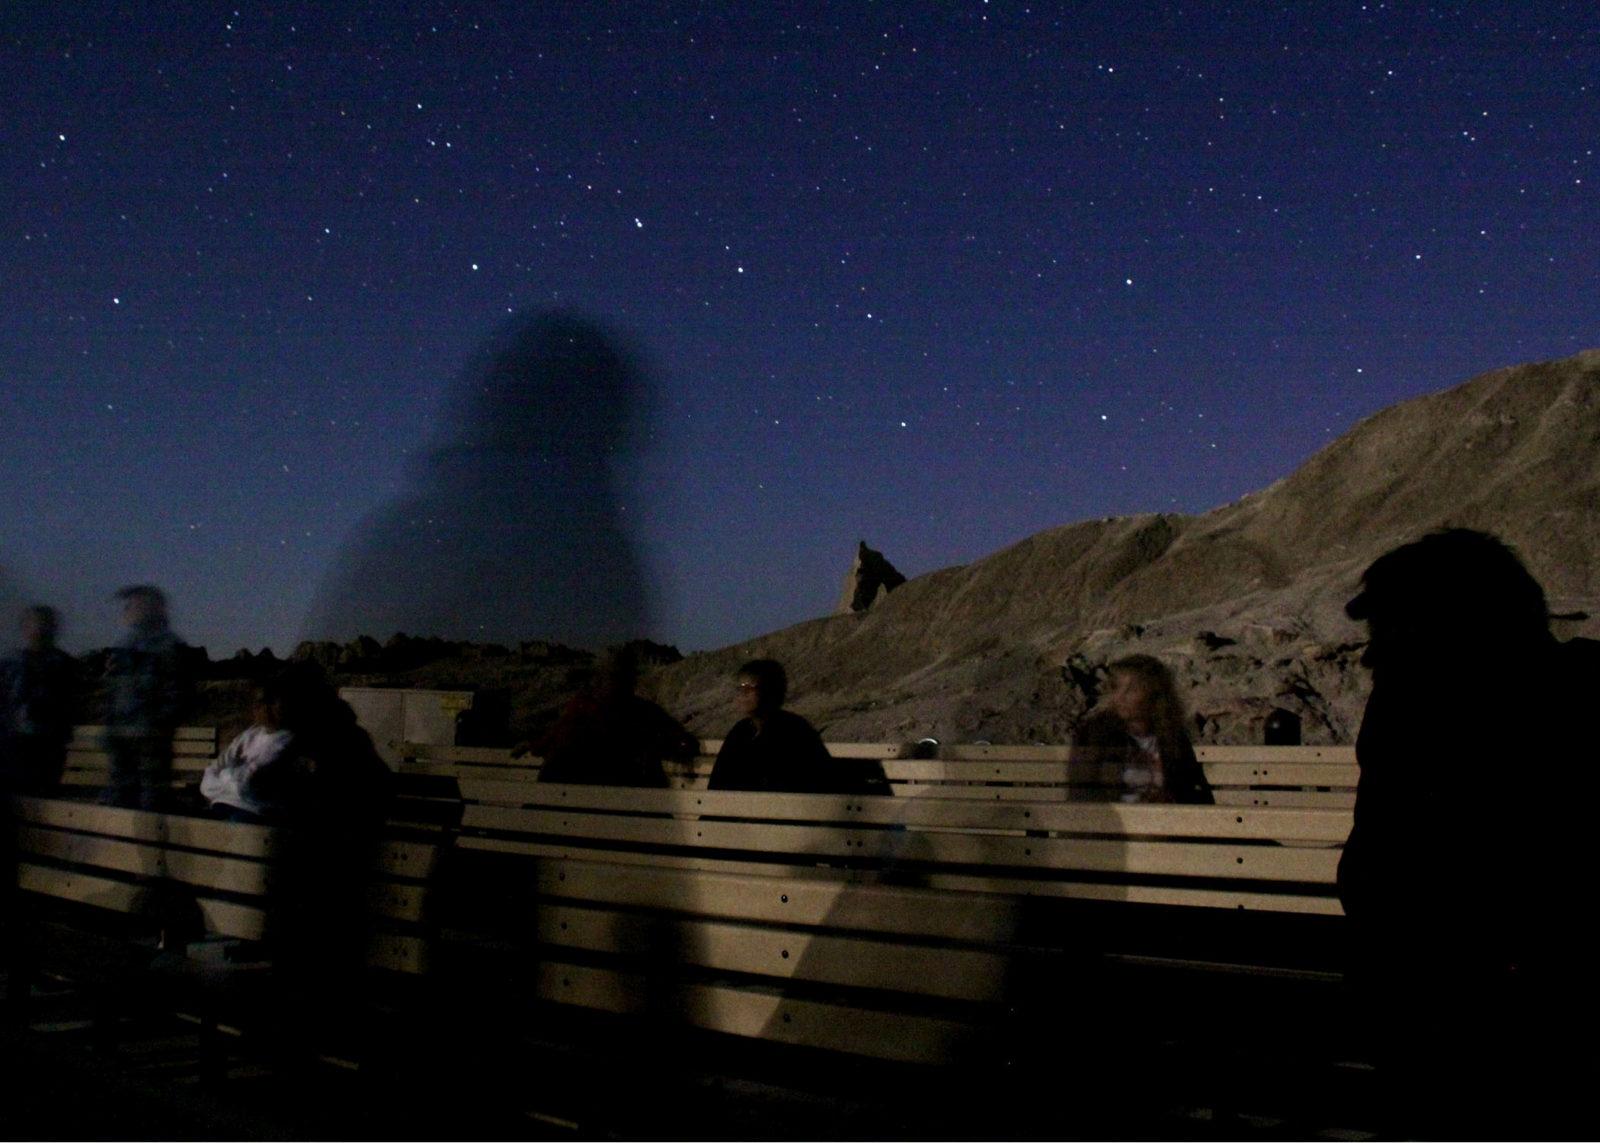 night sky ranger program at badlands national park